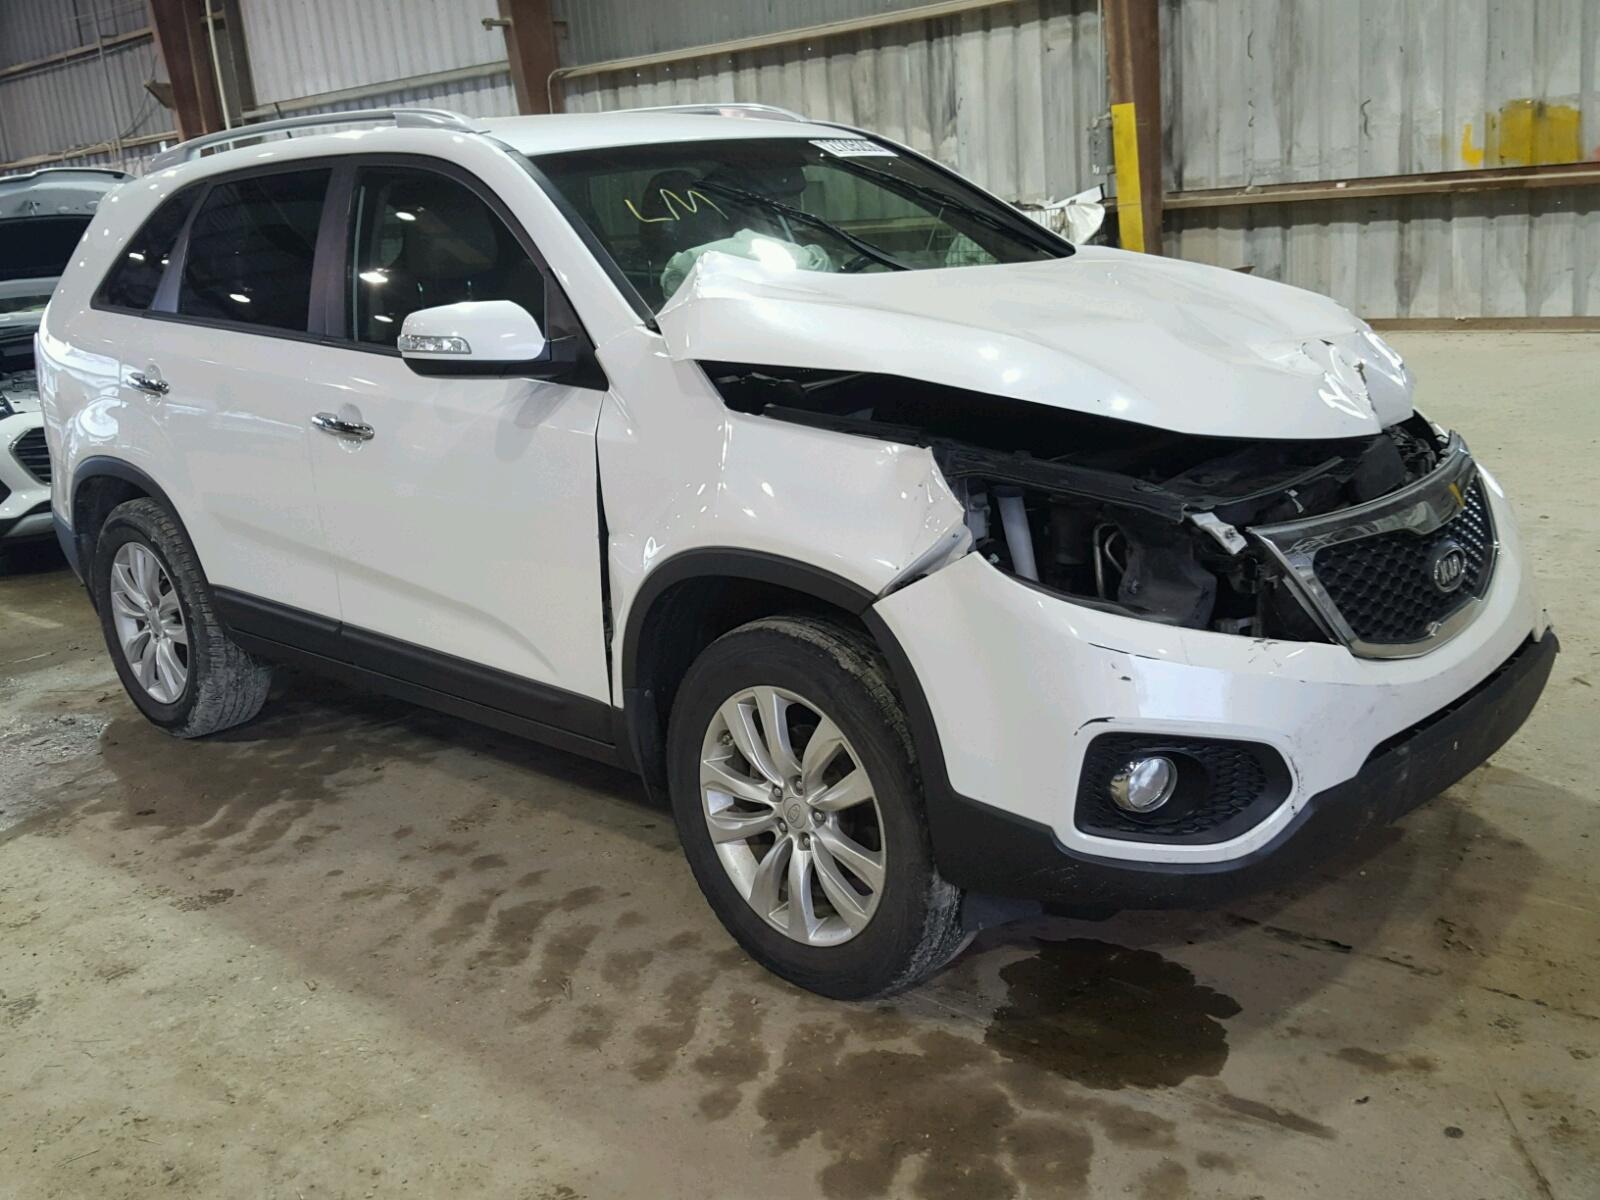 auctions right white auto en title kia online on la rouge forte salvage view lot sale of cert baton carfinder ex copart in